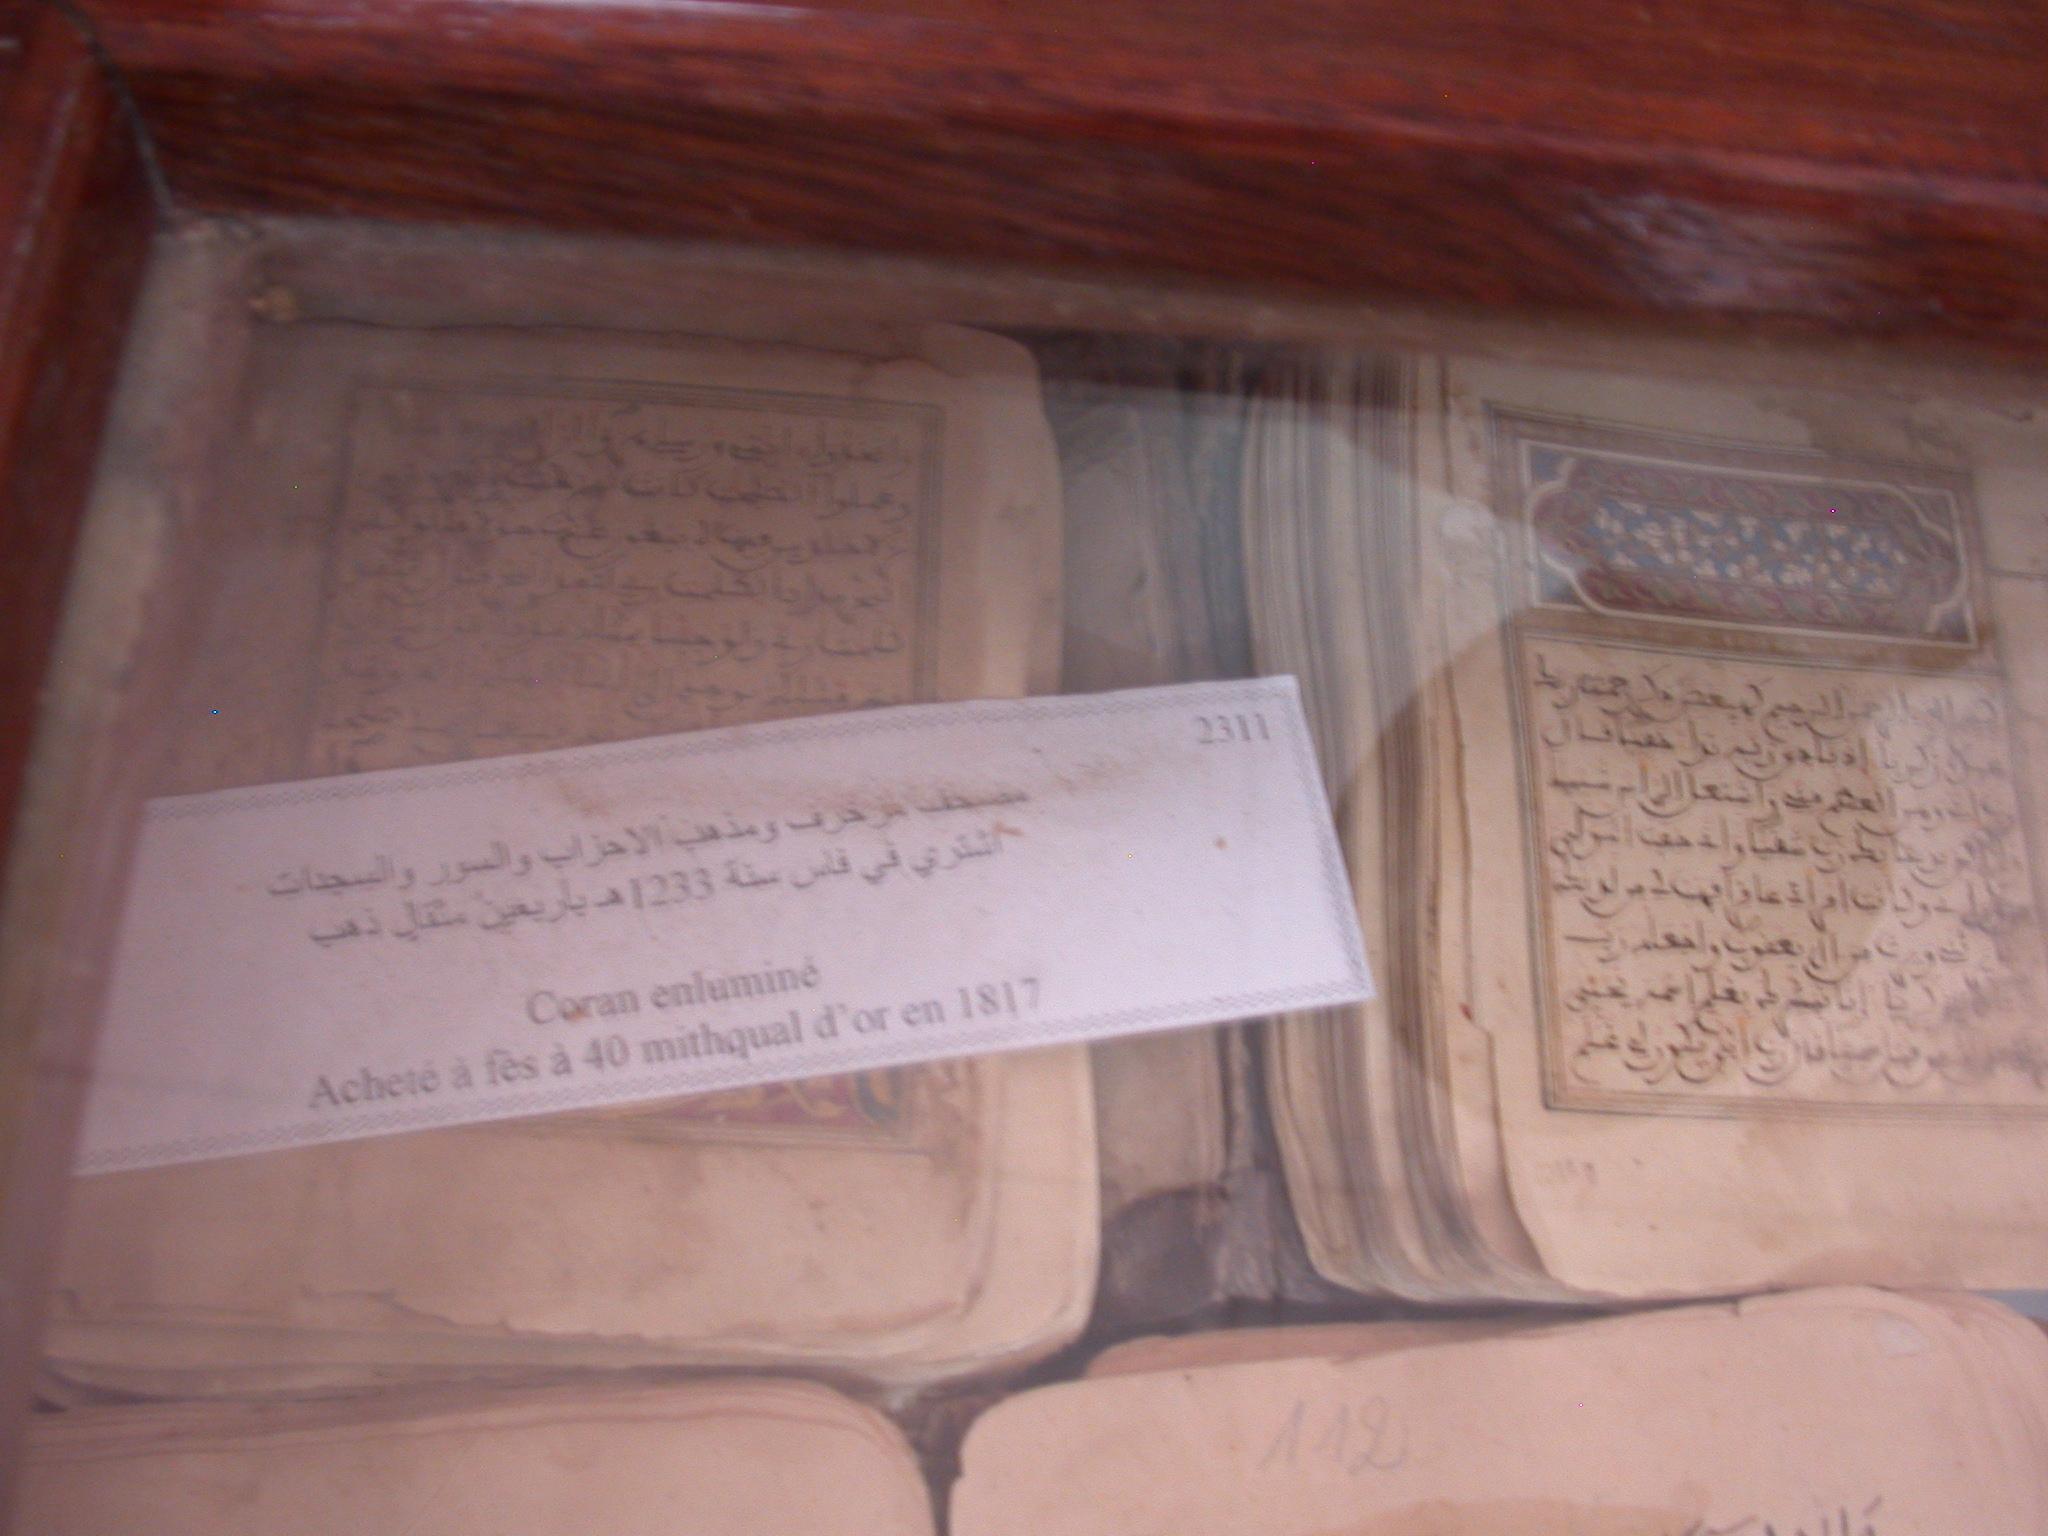 Manuscript, Illuminated Koran, Purchased in Fez for 40 Mithqual of Gold in 1817, Ahmed Baba Institute, Institut des Hautes Etudes et de Recherches Islamiques, Timbuktu, Mali